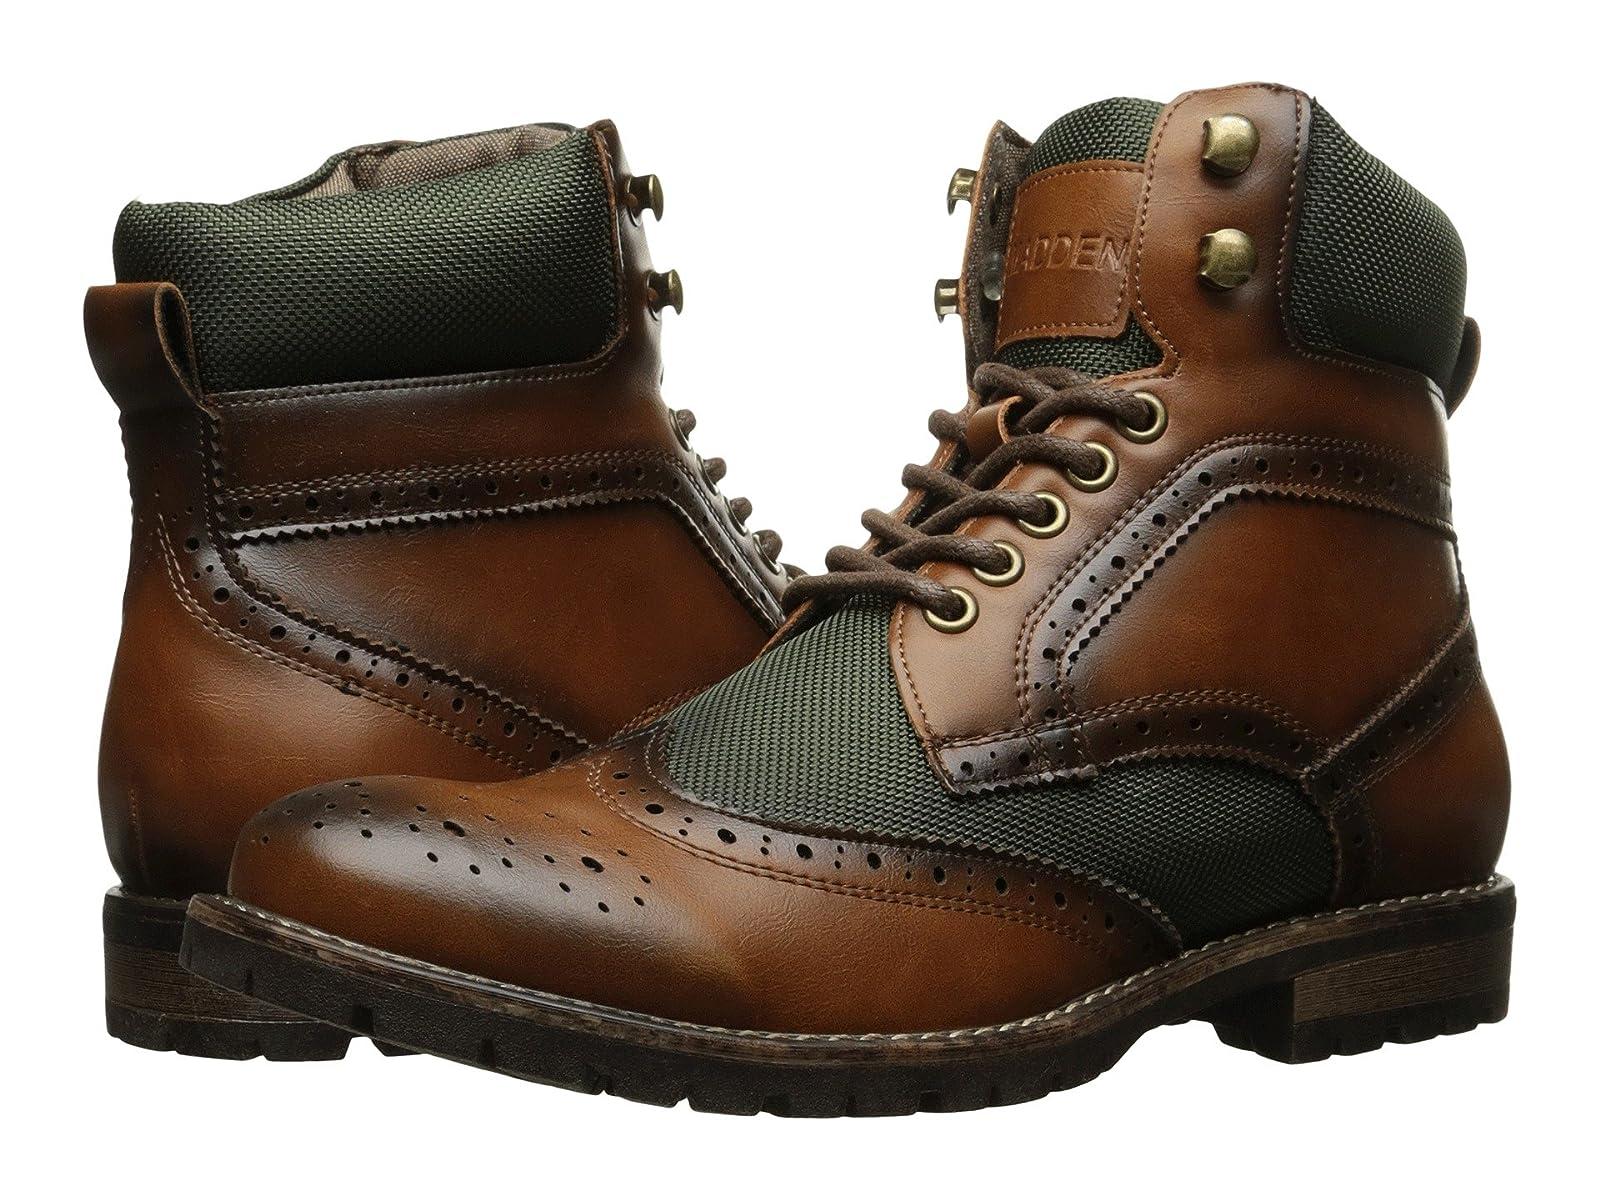 Steve Madden SorriCheap and distinctive eye-catching shoes